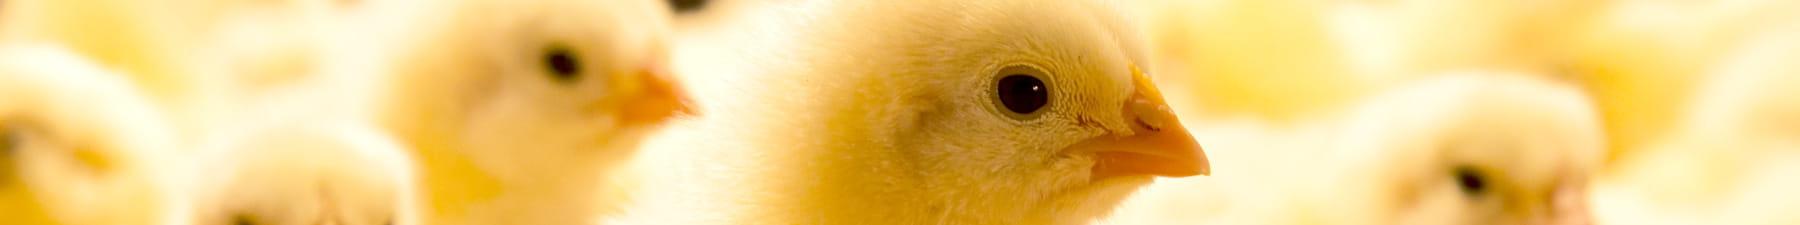 Flock of chicks